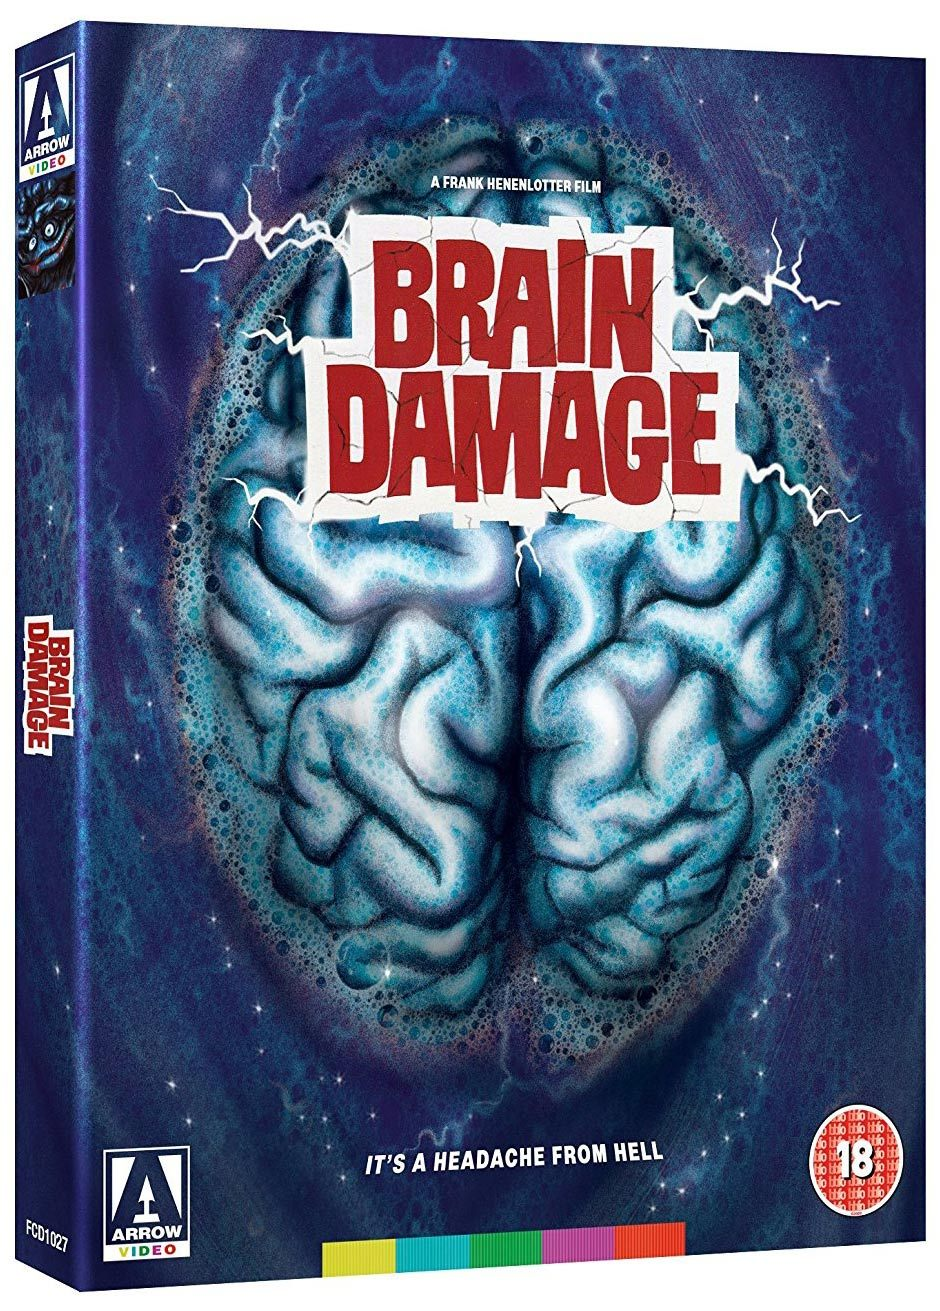 brain-damage-arrow-video.jpg